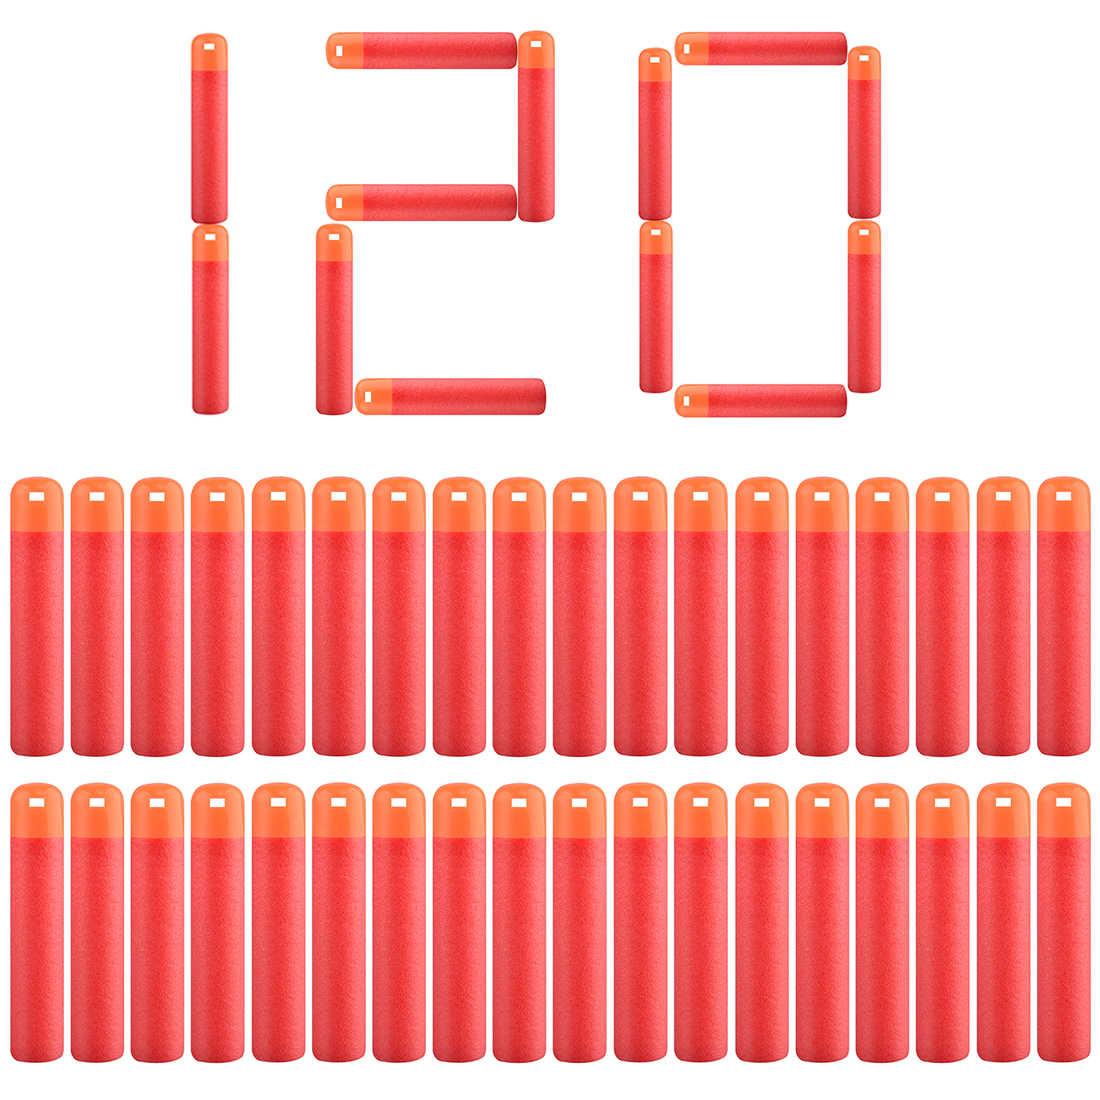 60 Buah/Banyak 9.5Cm Merah Senapan Sniper Anak Panah Peluru Nerf Mega Mainan Anak Busa Isi Ulang Panah Lubang Besar Kepala peluru Hadiah Natal